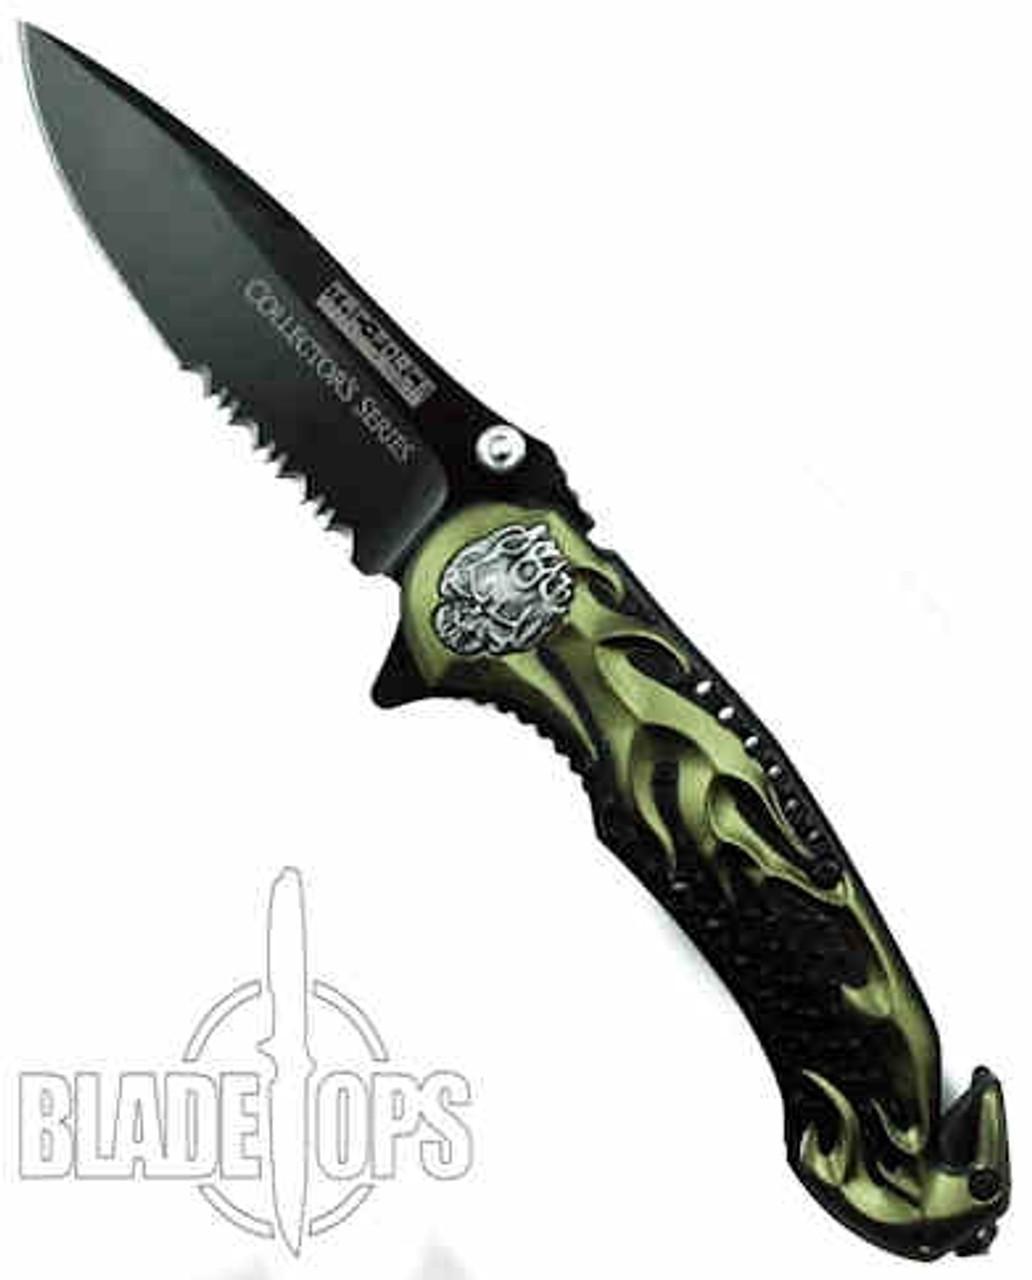 Green Skull Rider Spring Assist Knife, Tactical Combo Blade